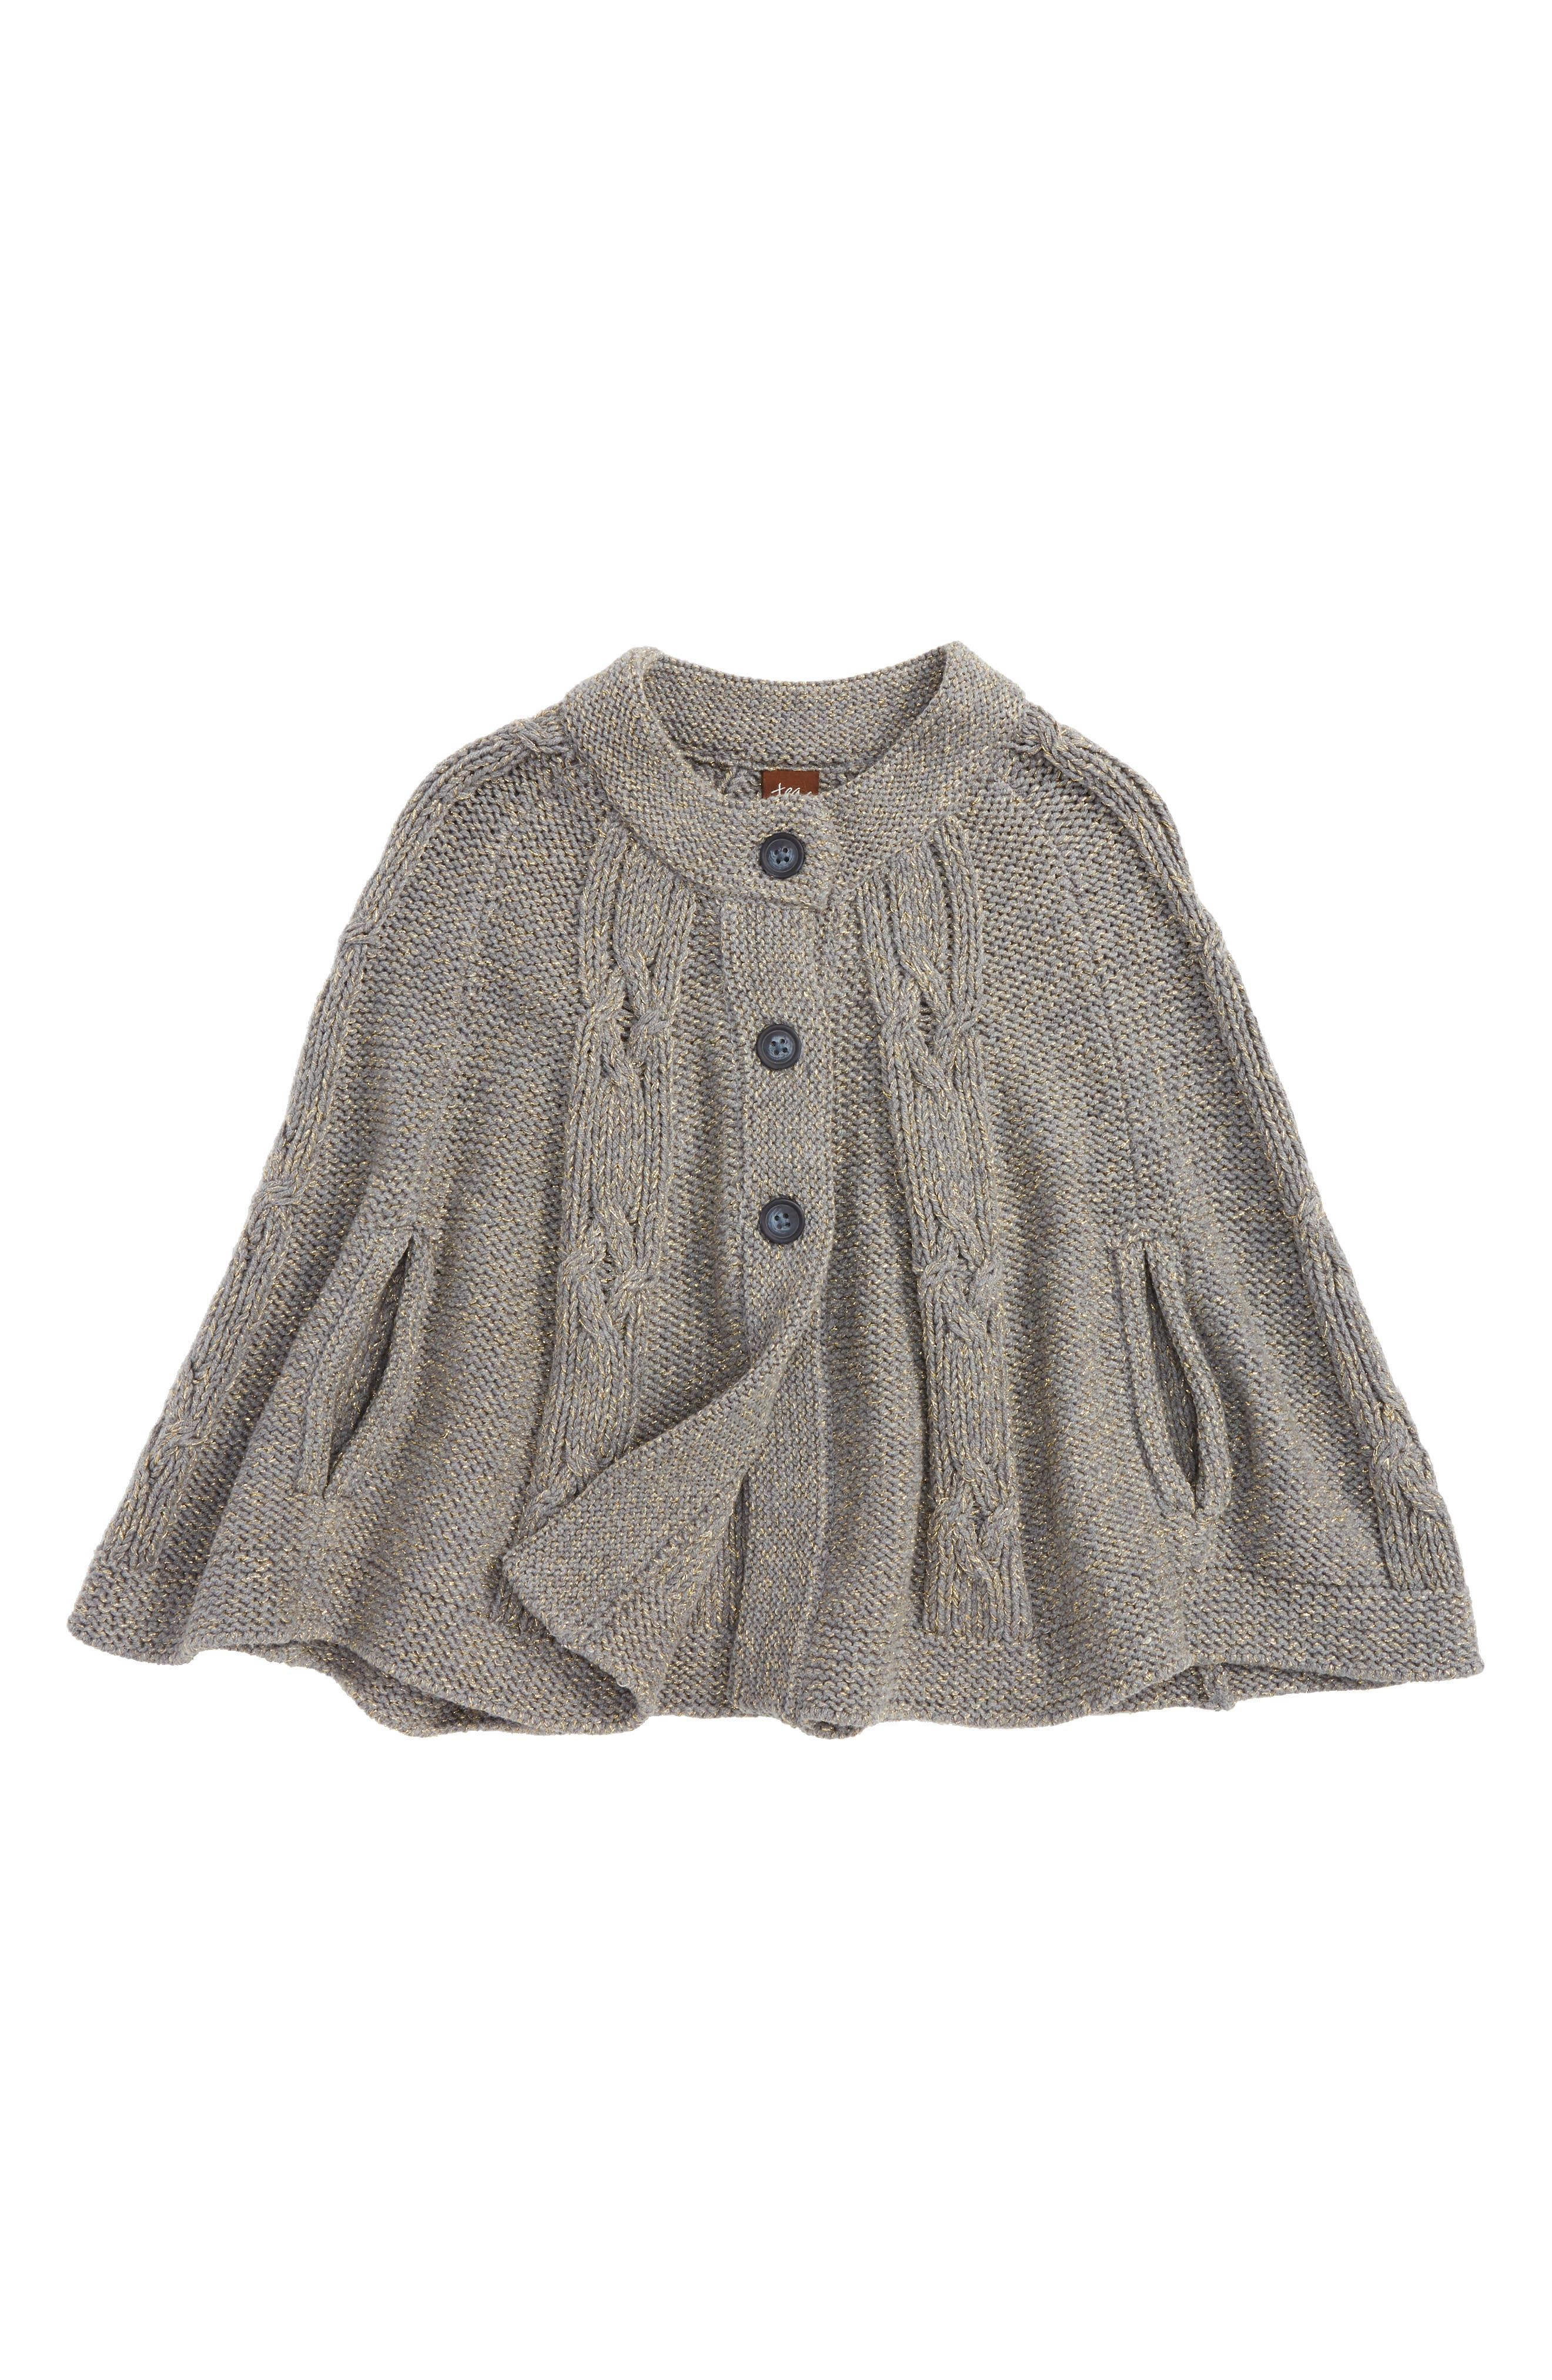 Isobel Sweater Cape,                         Main,                         color, 034